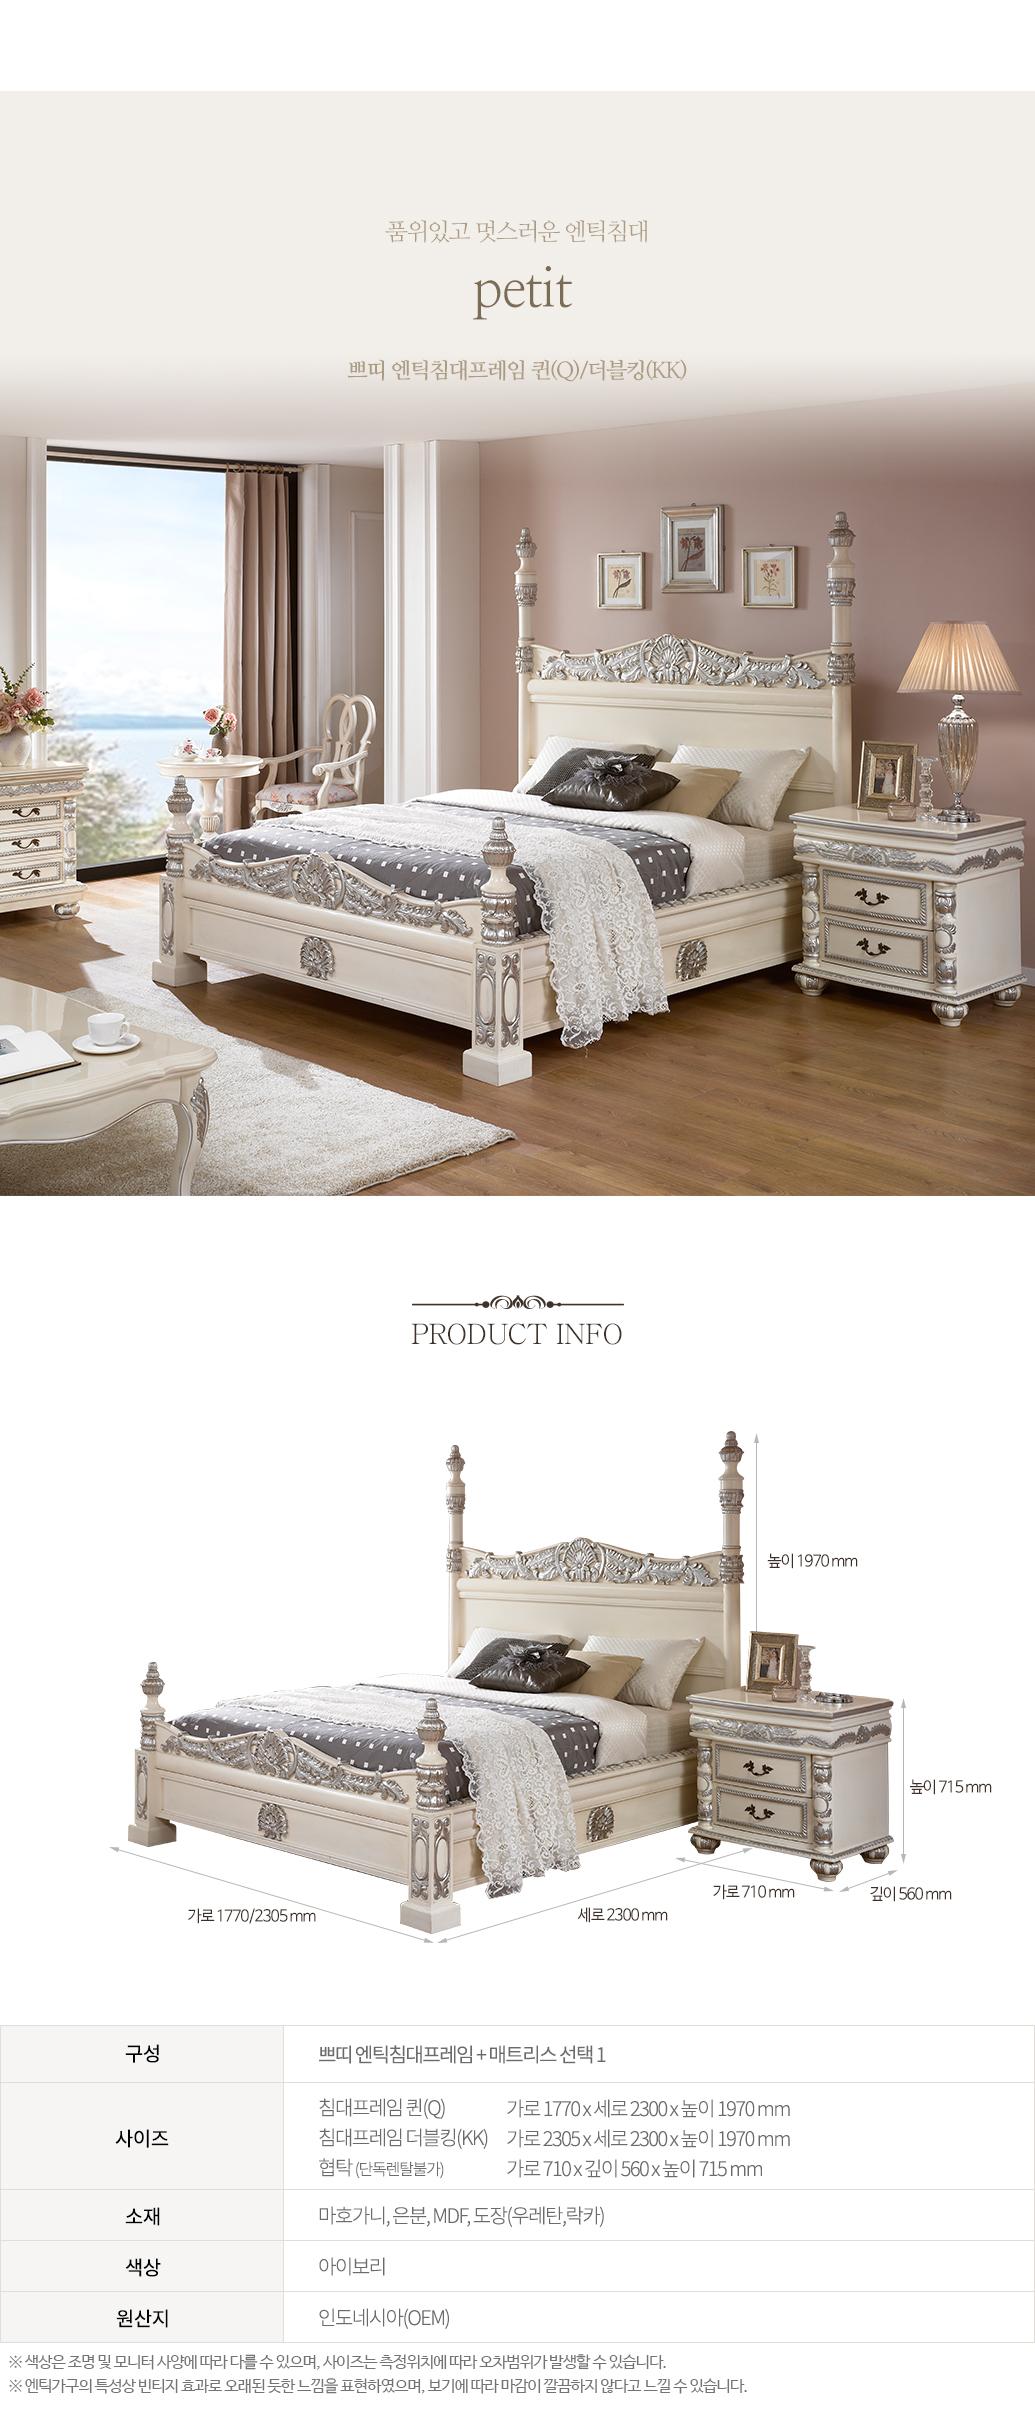 petit_bed_01.jpg